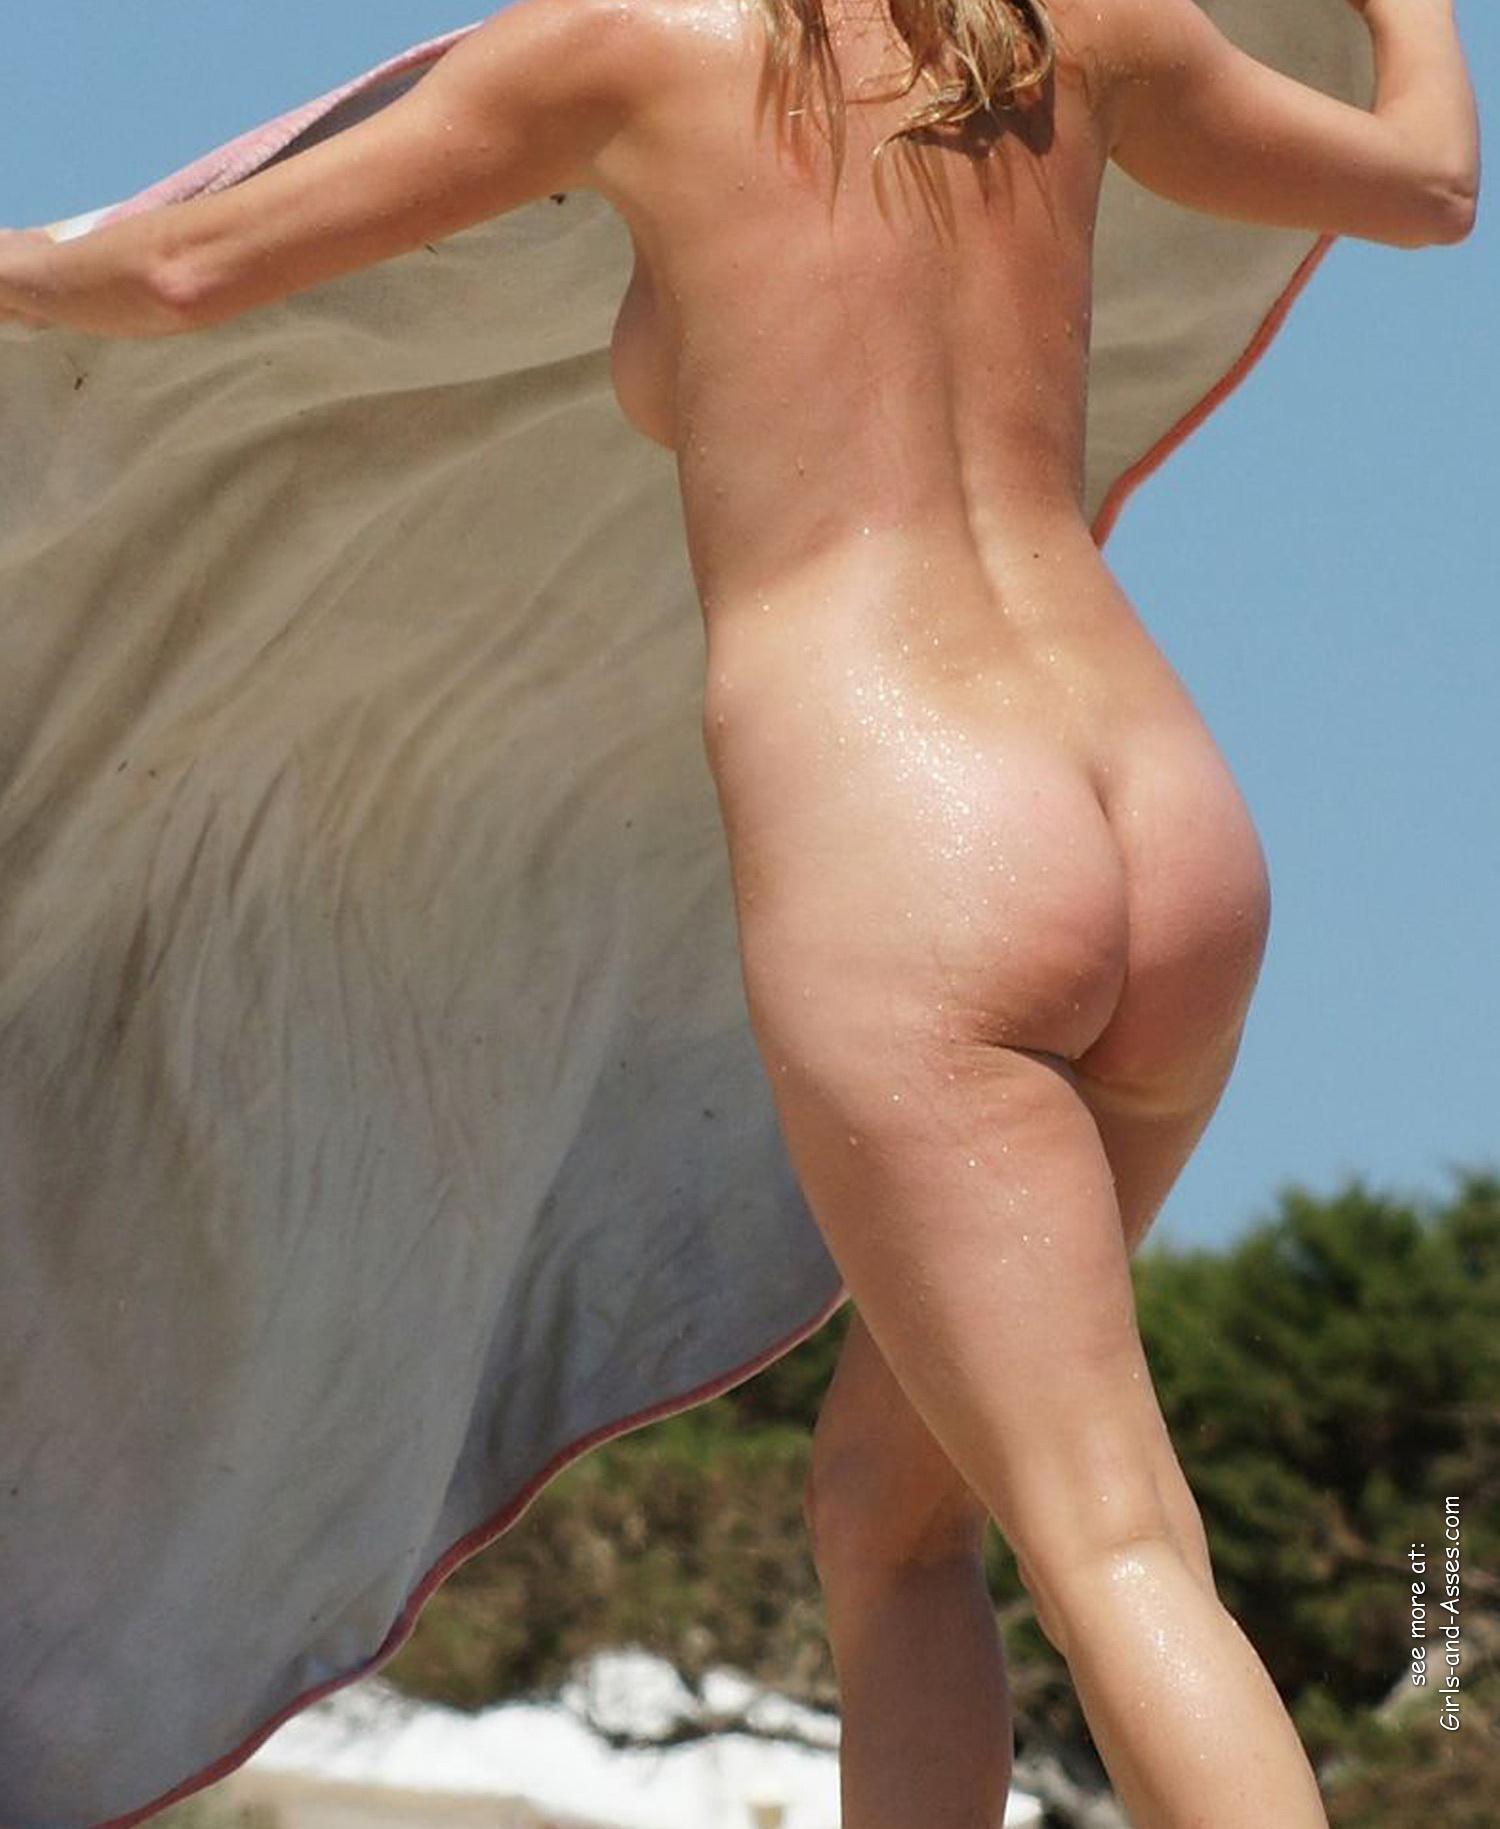 amatuer nude girl at the beach photography 03229